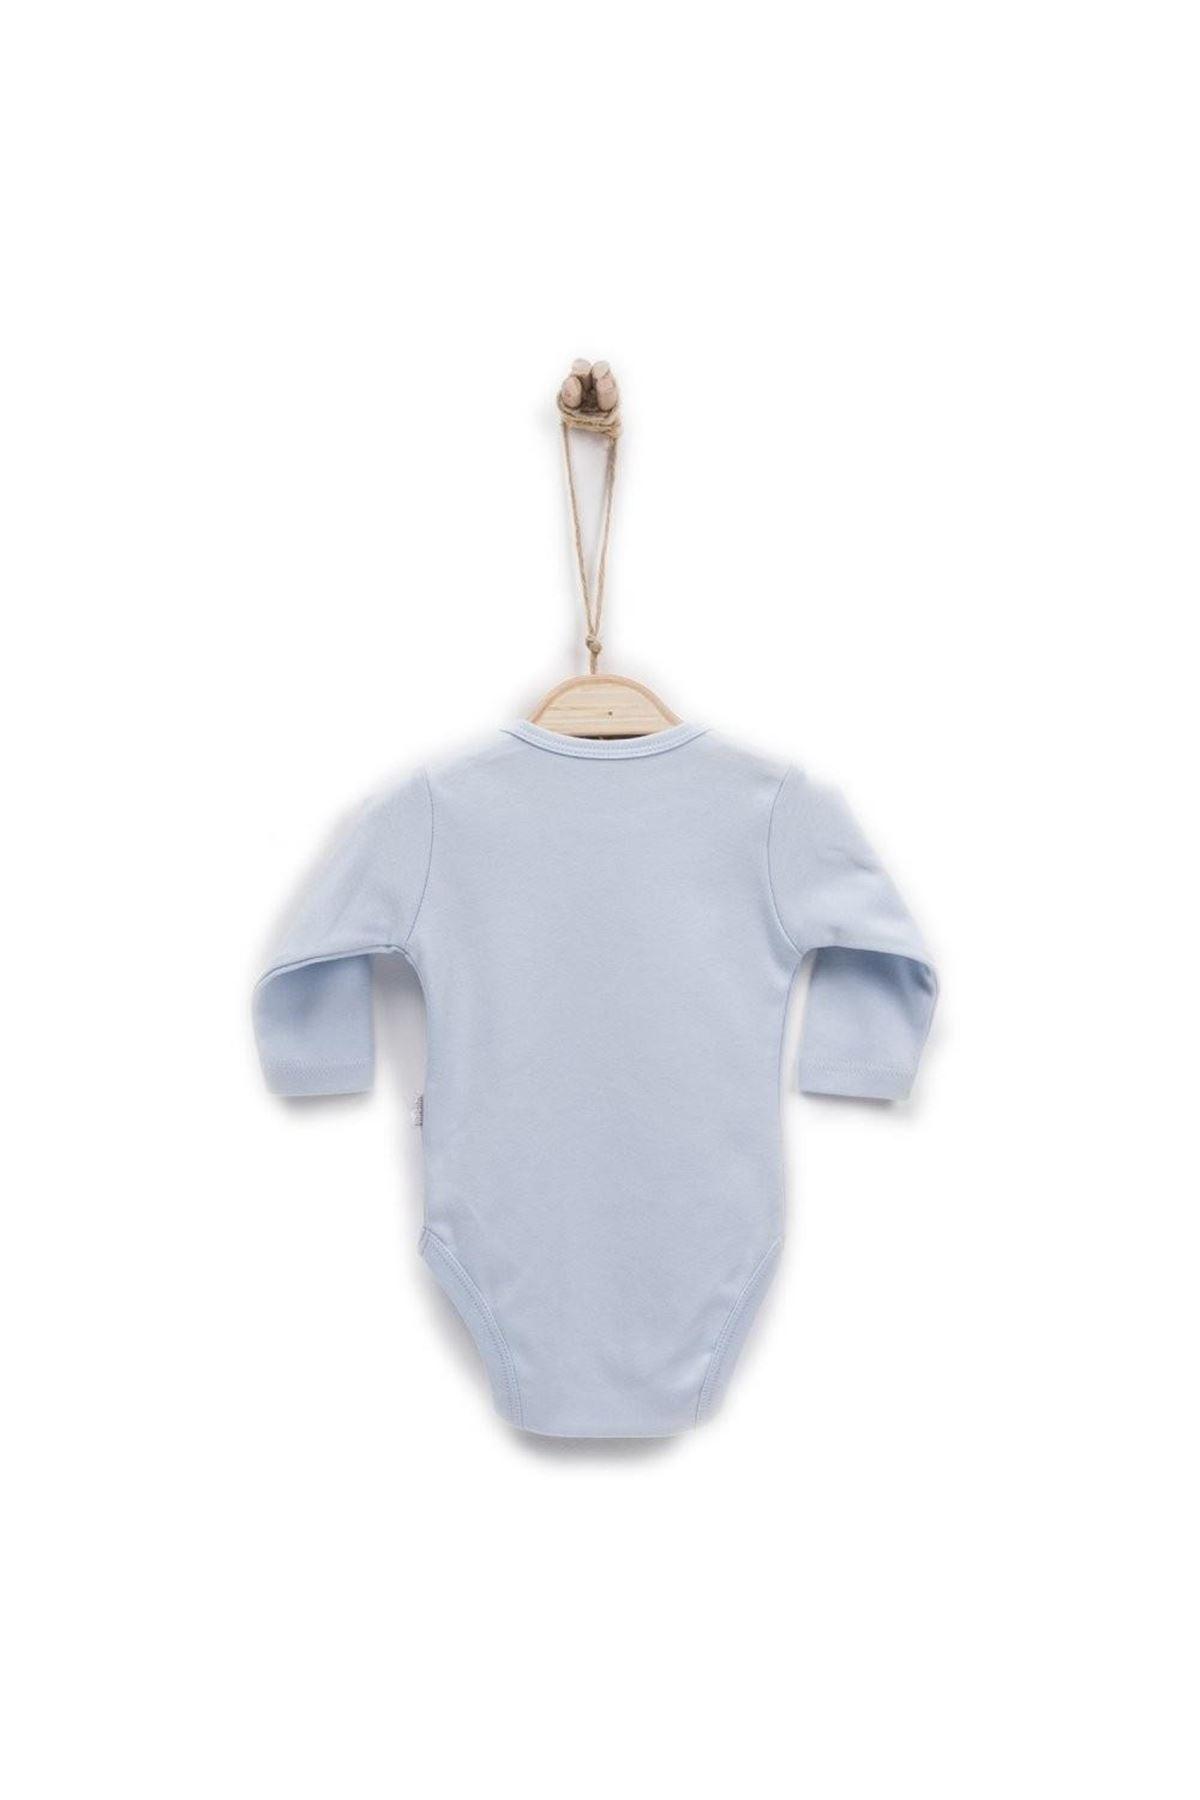 KitiKate Organik Uzun Kol Bebe Body 76582 Mavi